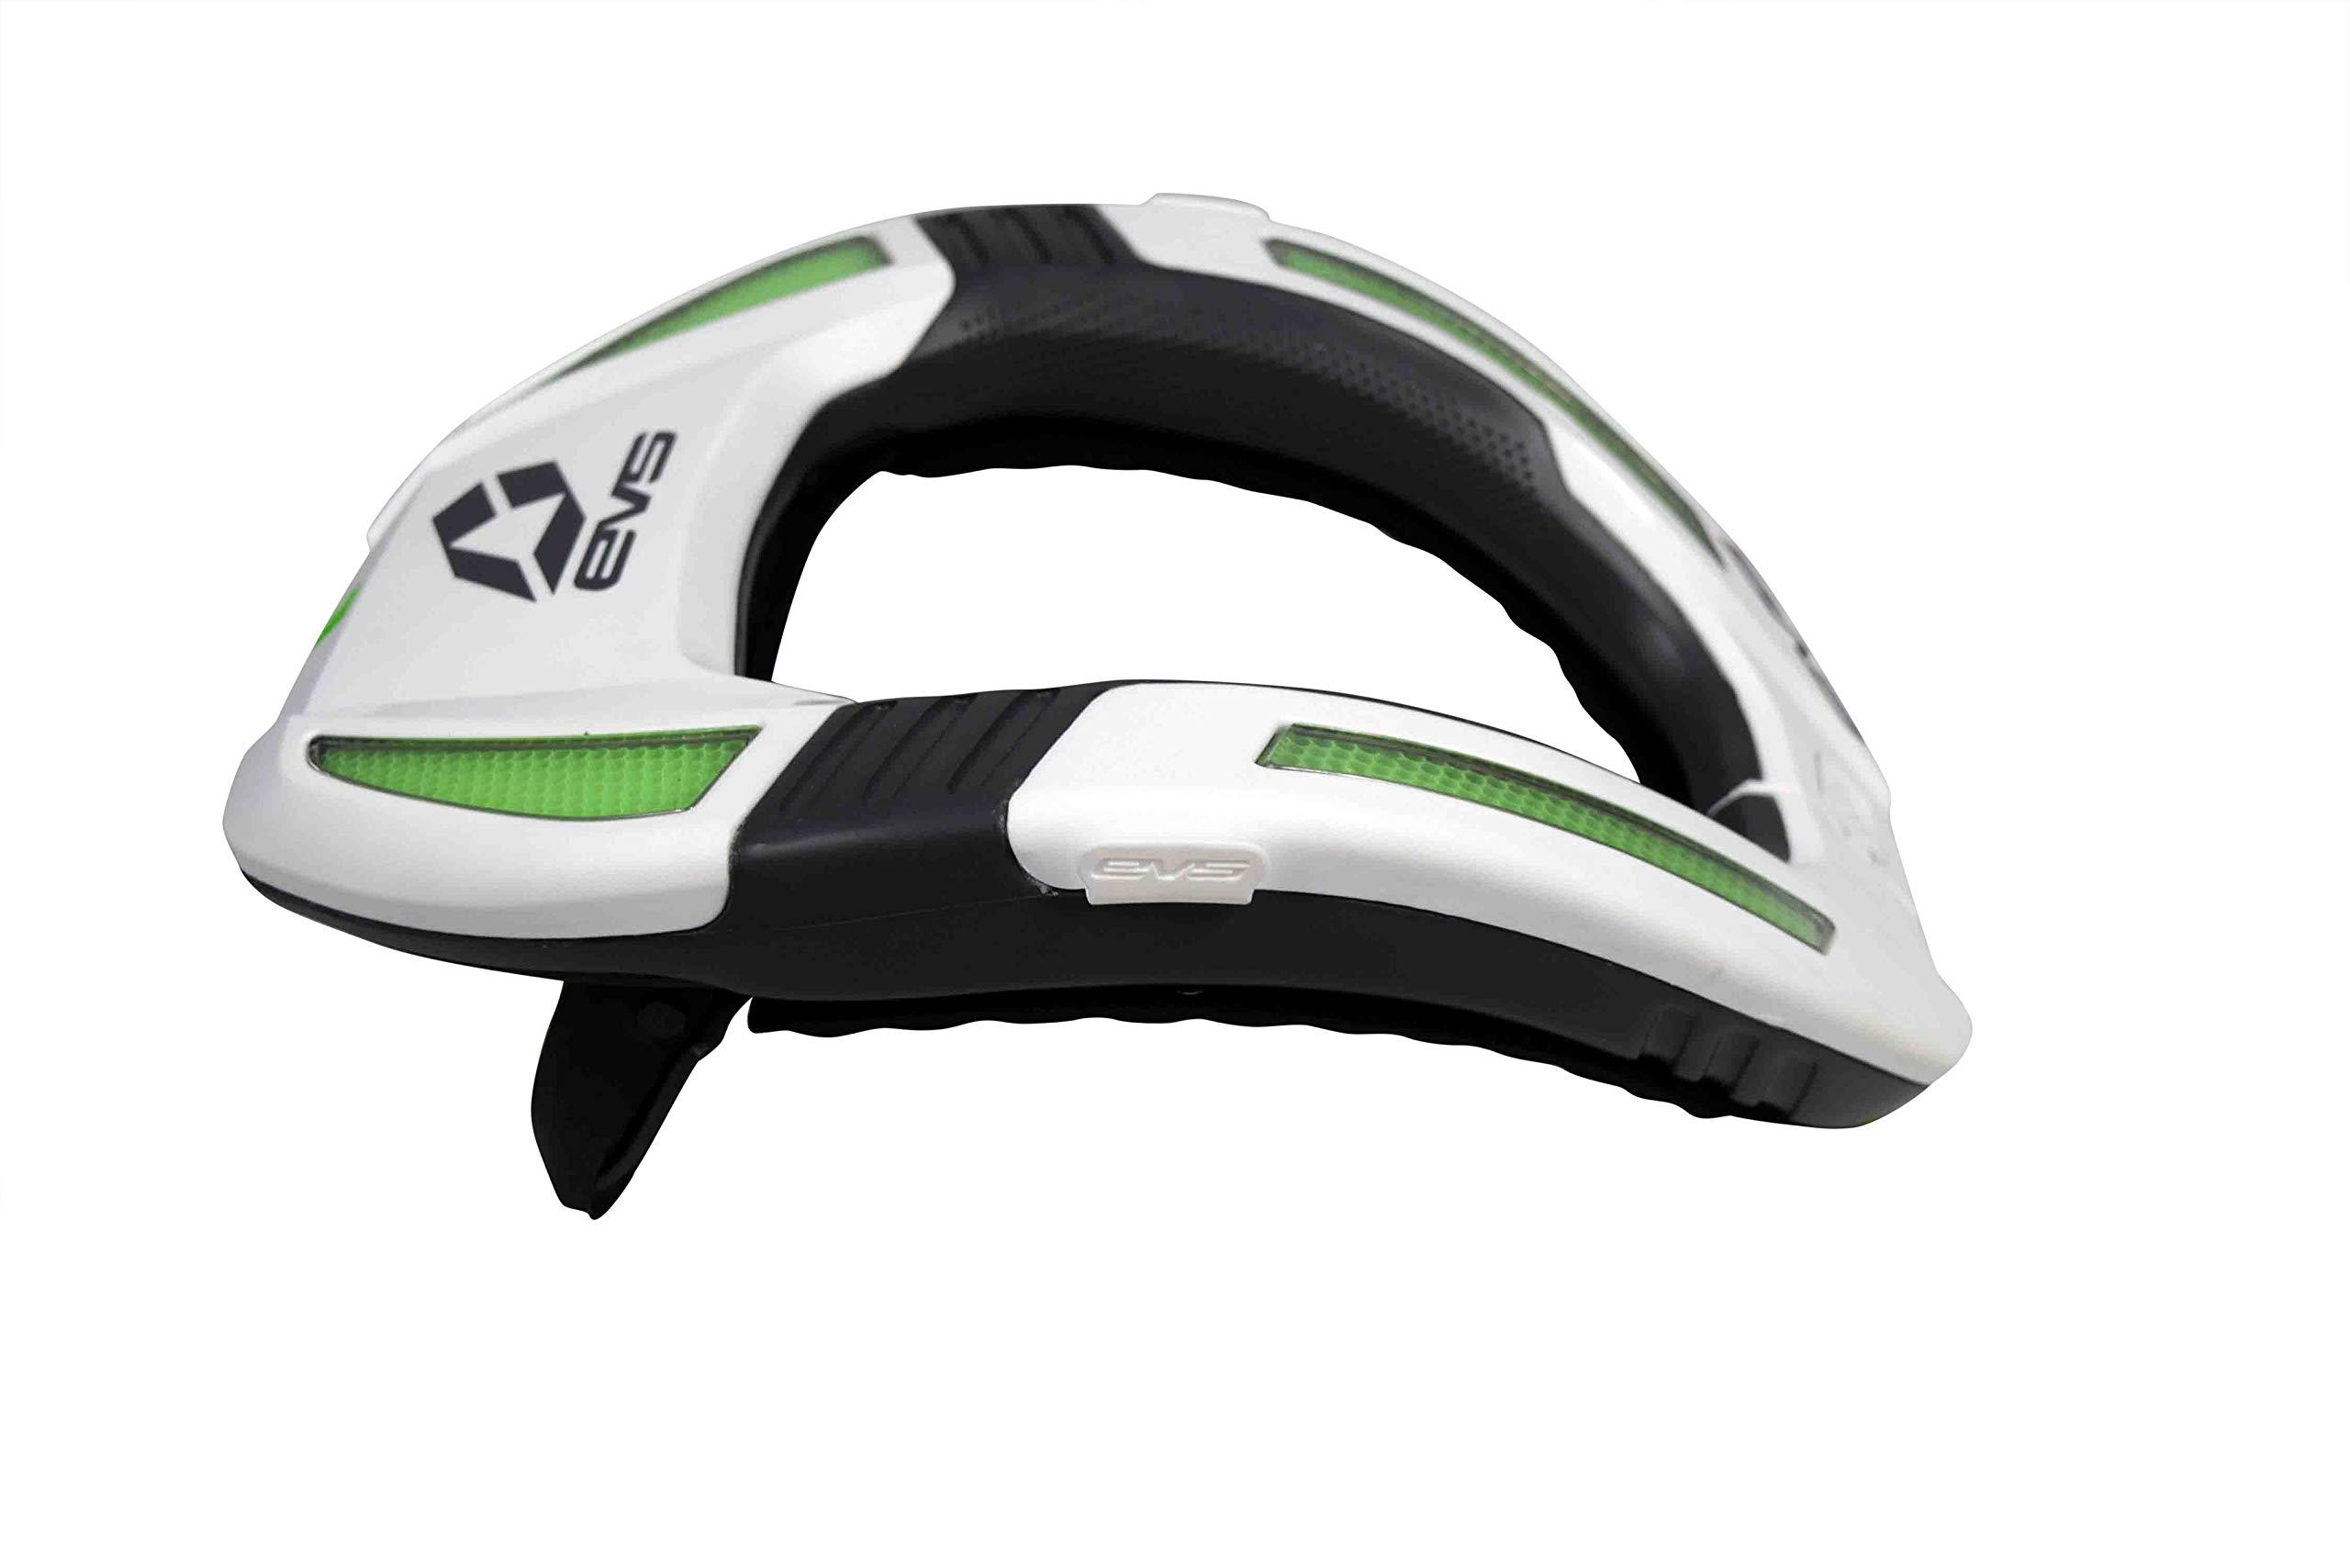 EVS Sports R4K-W-A Koroyd Race Collar White Size Adult Neck Brace